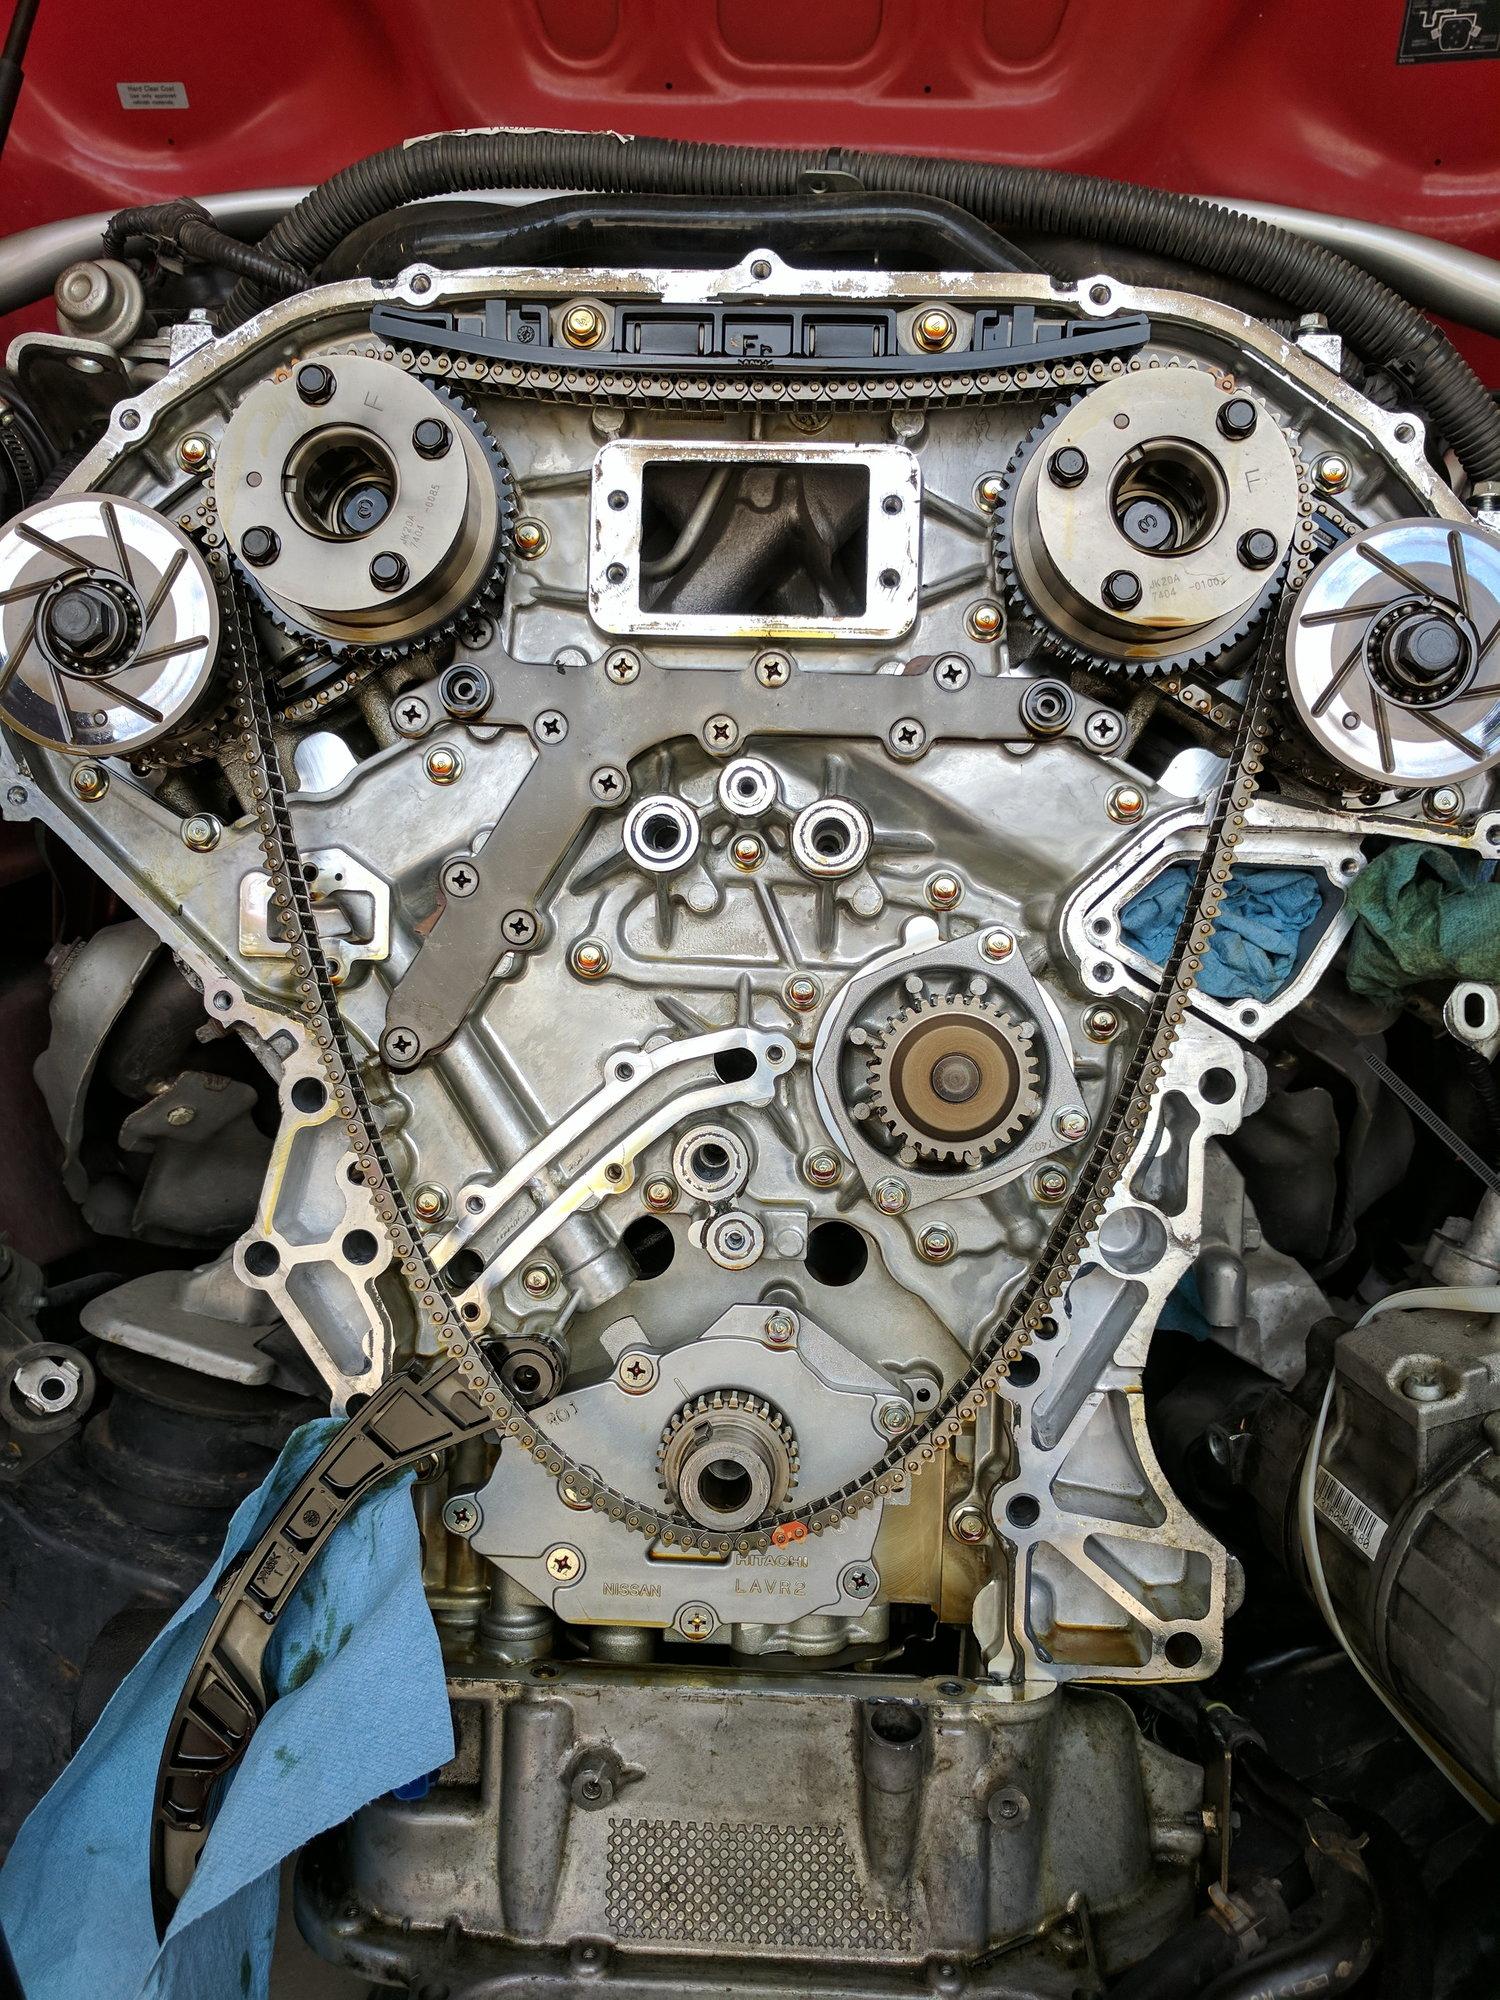 low oil pressure still - MY350Z COM - Nissan 350Z and 370Z Forum